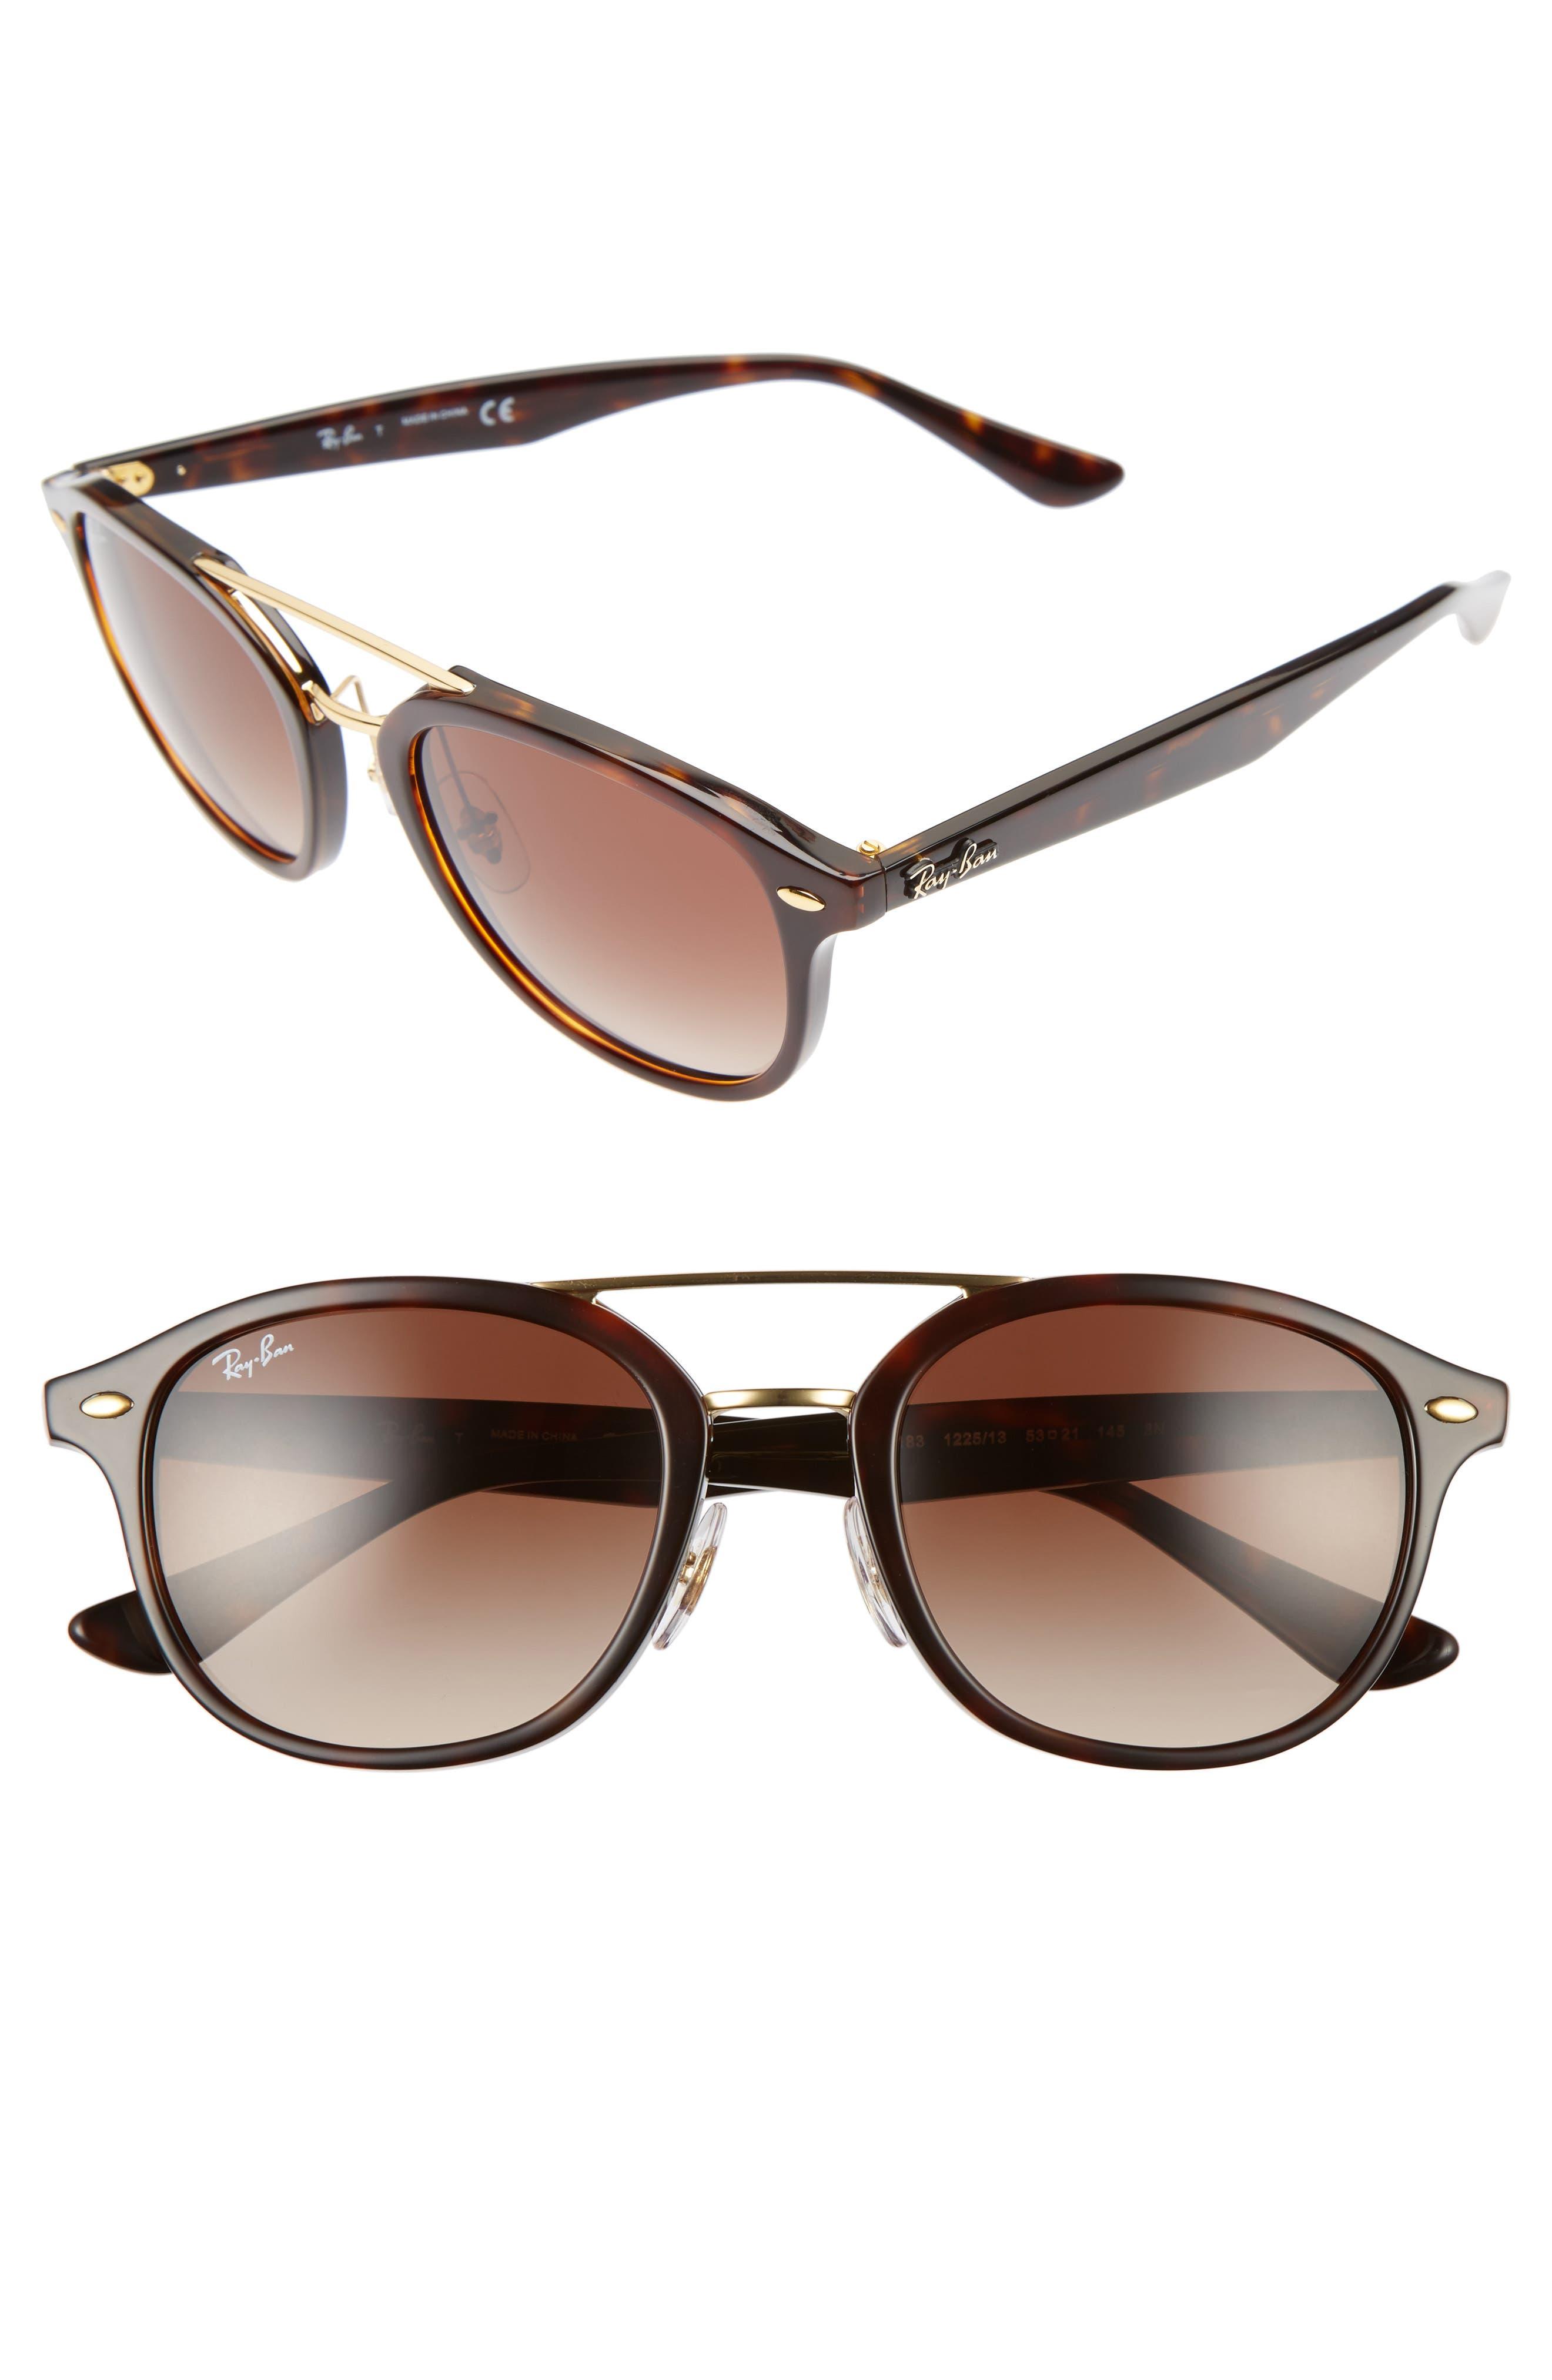 53mm Aviator Sunglasses,                             Main thumbnail 1, color,                             905